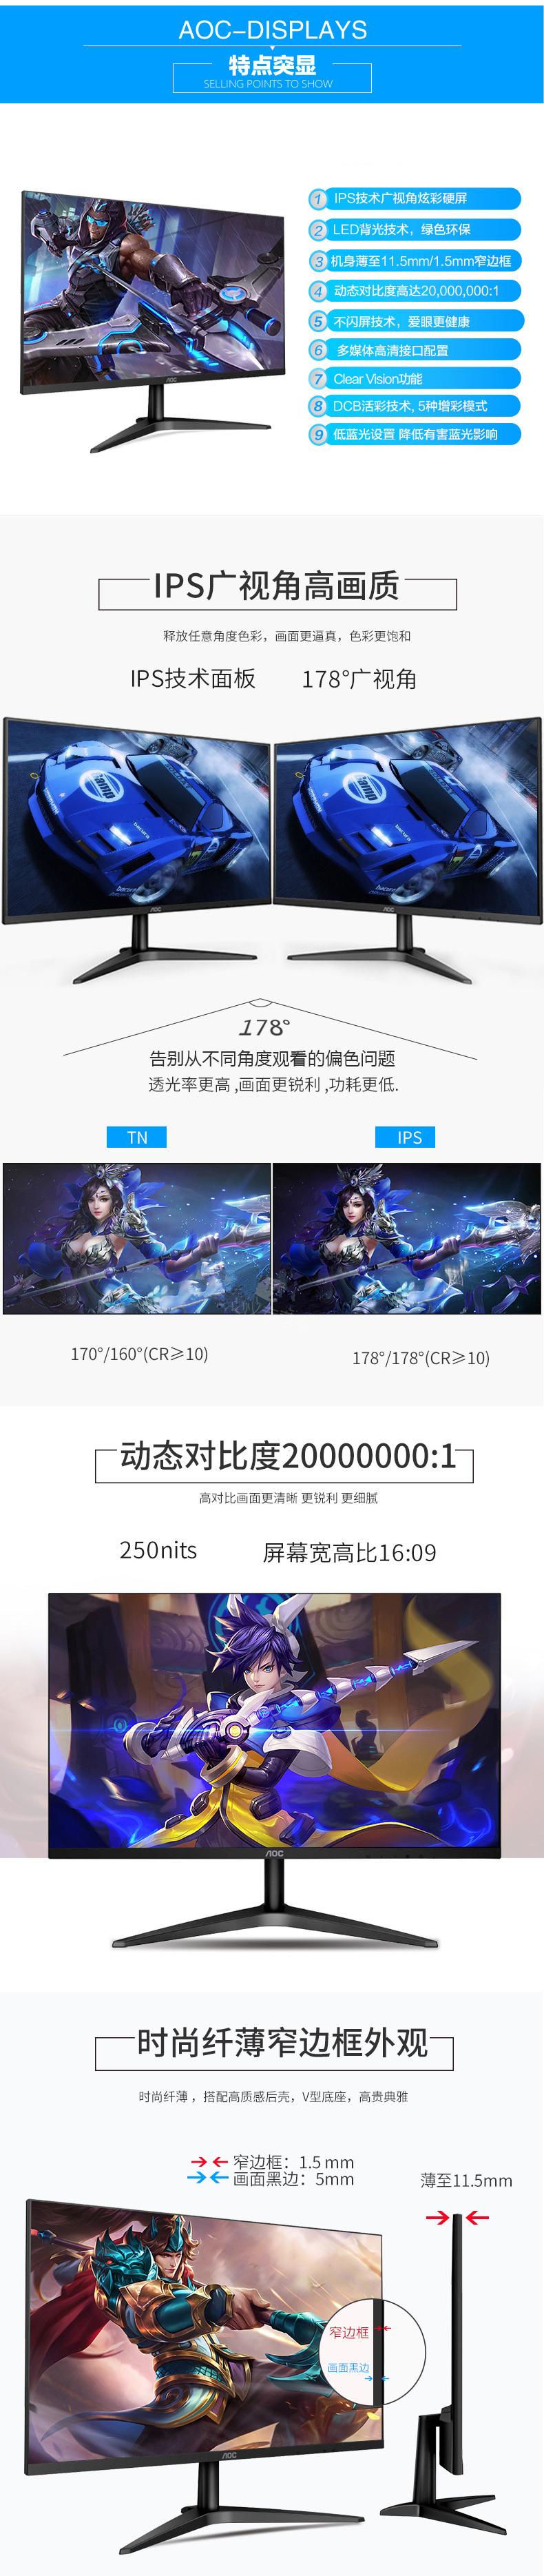 AOC显示器24B1XH 23.8万博手机版客户端下载显示屏 IPS广视角屏幕1080P HDMI 低蓝光爱眼不闪屏电脑显示器